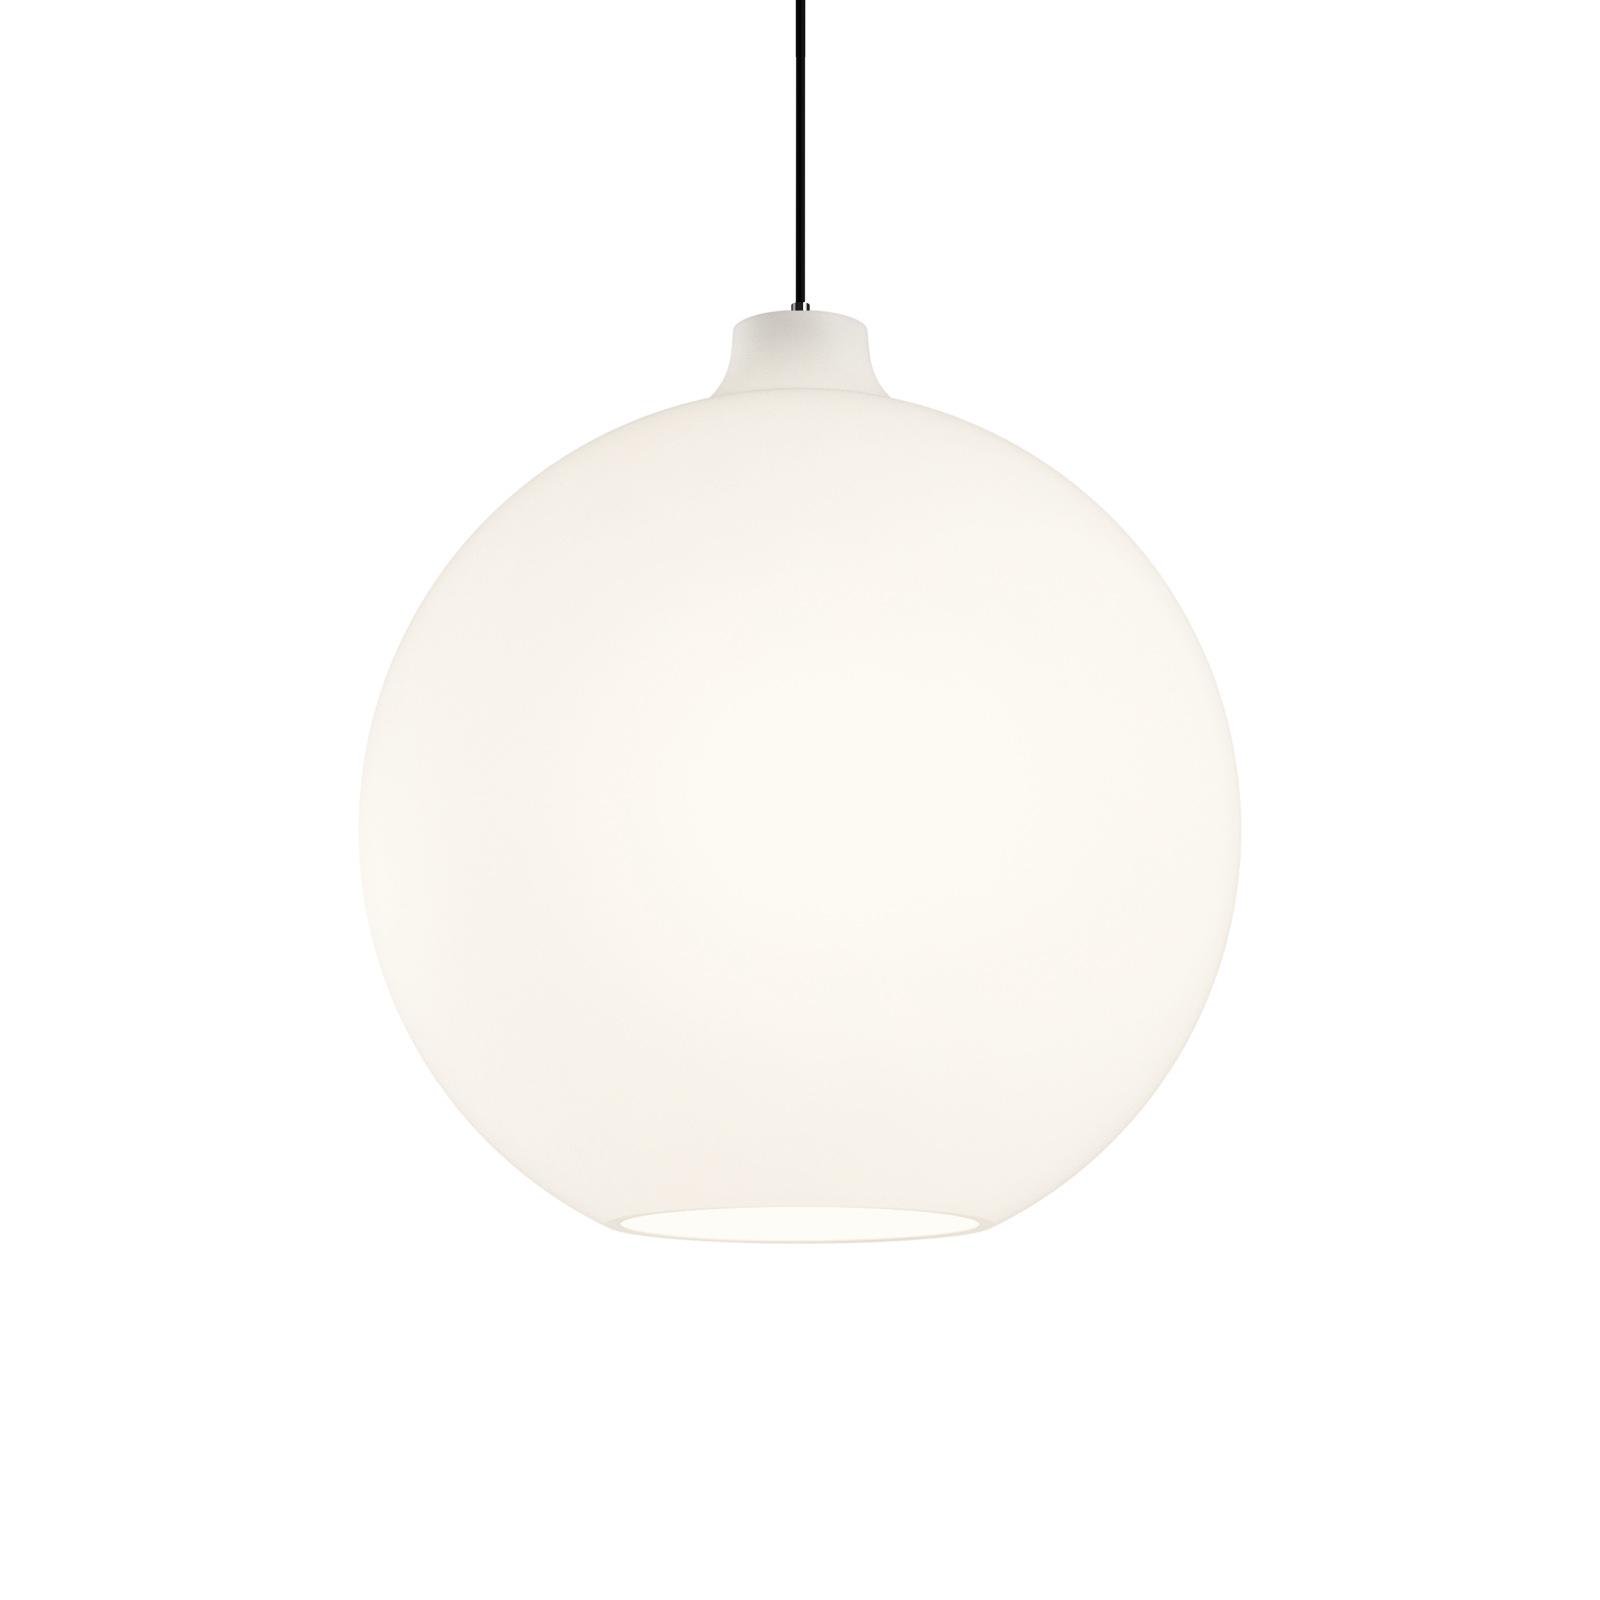 Louis Poulsen Wohlert glas-hanglamp Ø 40 cm